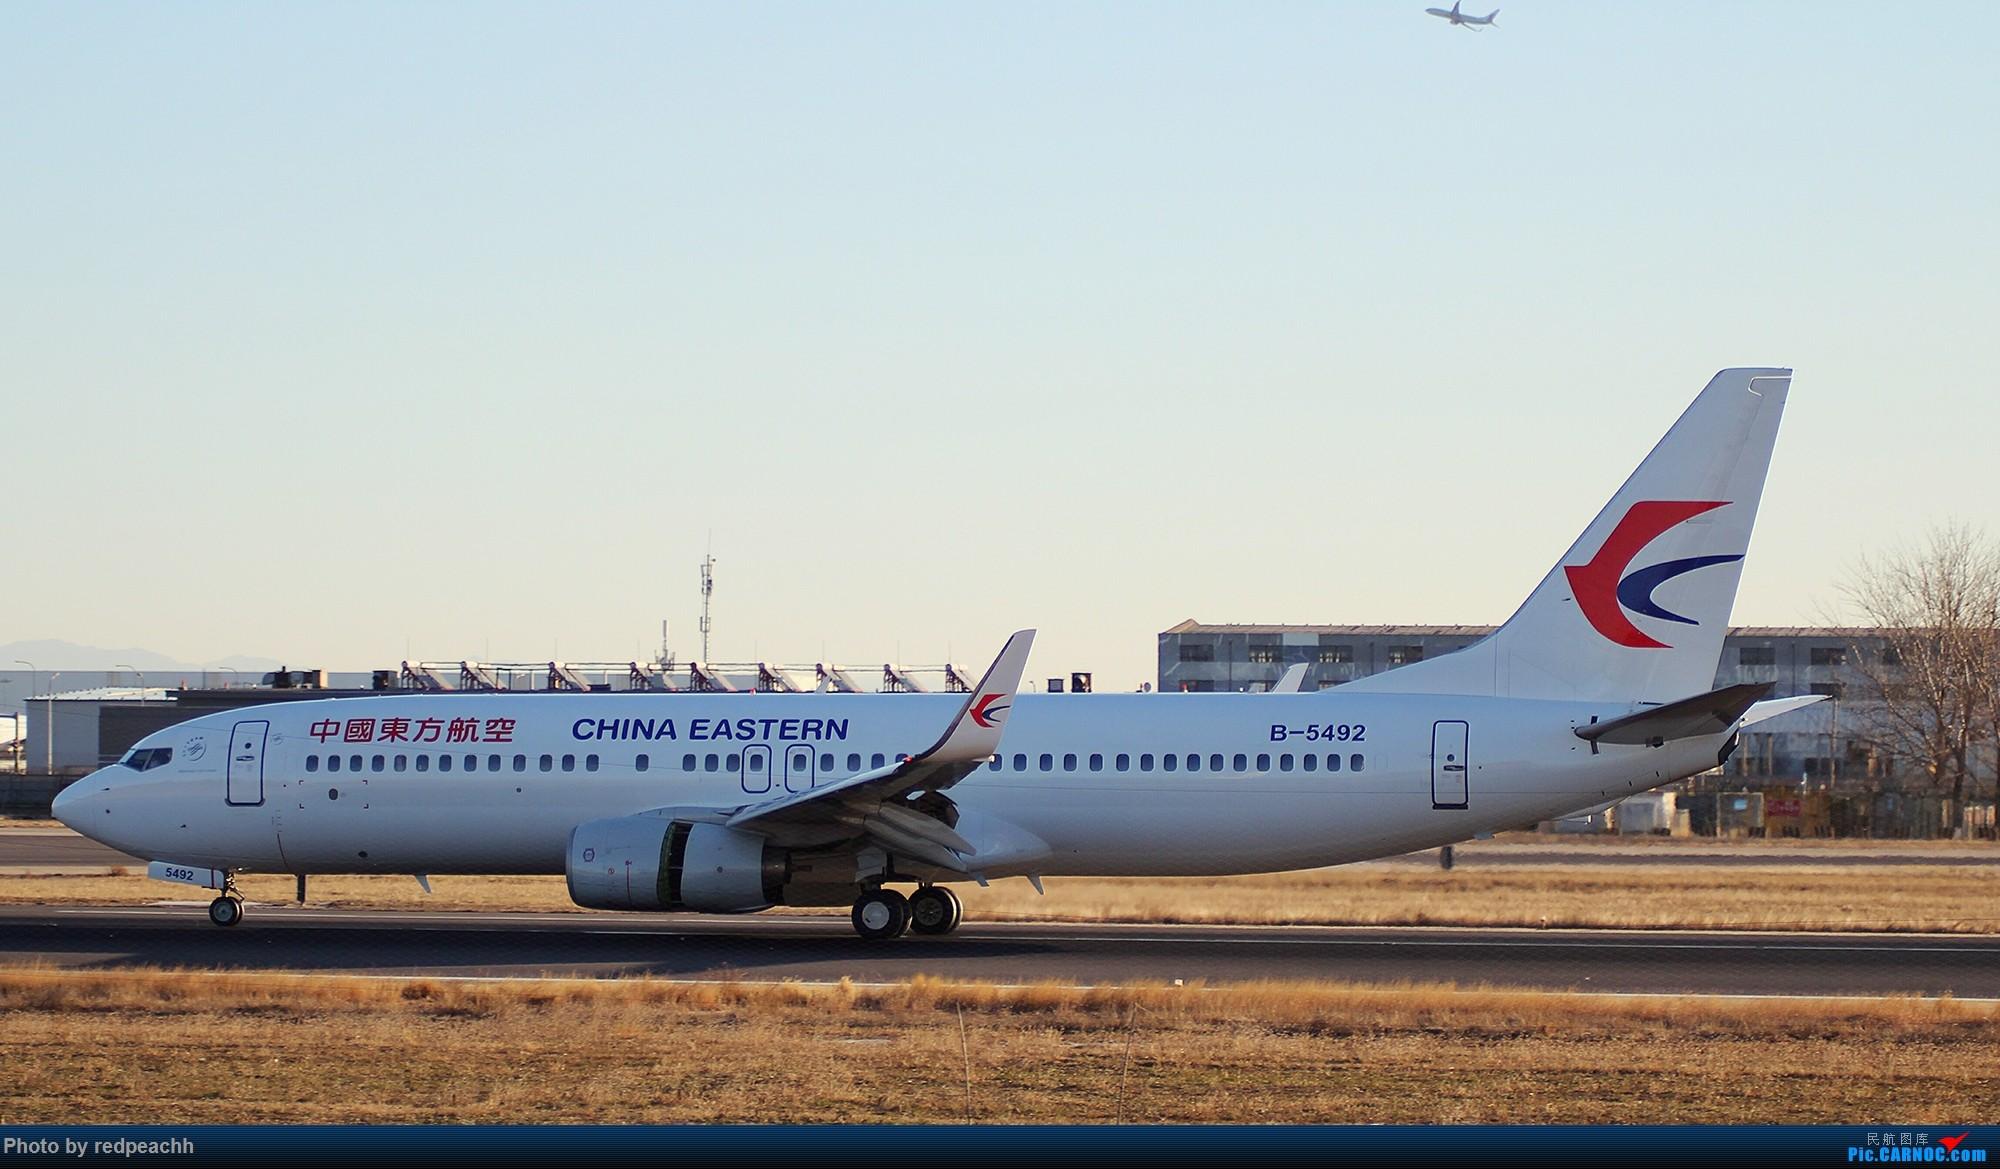 Re:[原创](持续更新)河北人为拍机而首都机场2日游(杨二营、八卦台)虽均为常规货但值得纪念(36L) BOEING 737-800 B-5492 中国北京首都国际机场